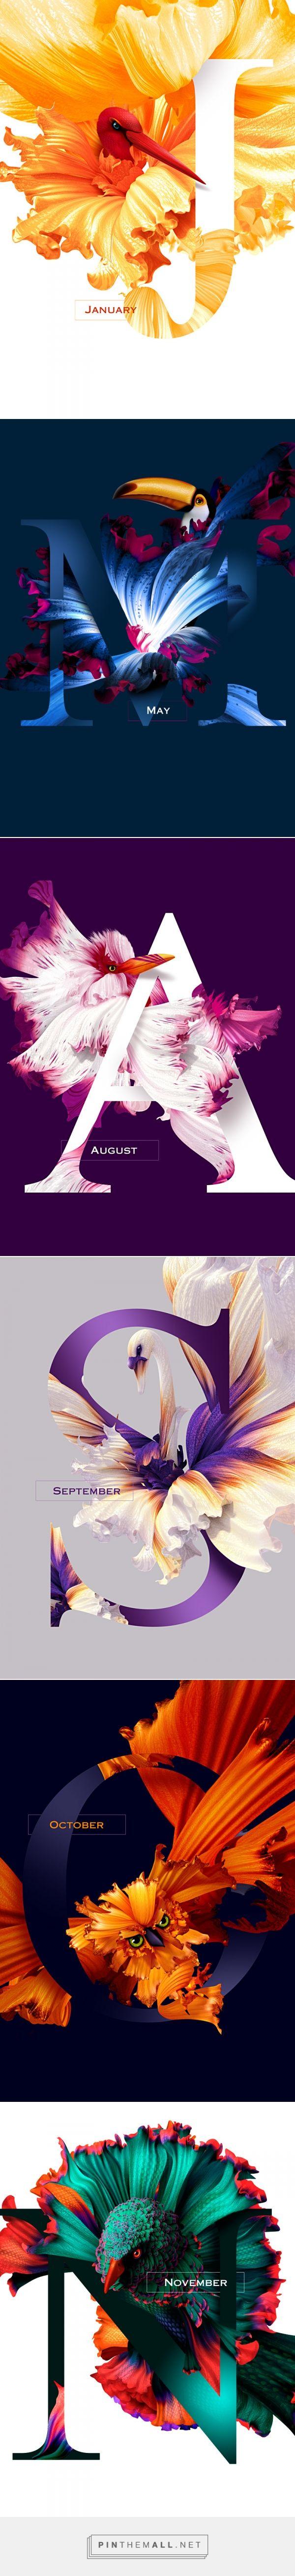 Flying Flowers 2016 by Artur Szygulski on Behance    Fivestar Branding – Design and Branding Agency & Inspiration Gallery